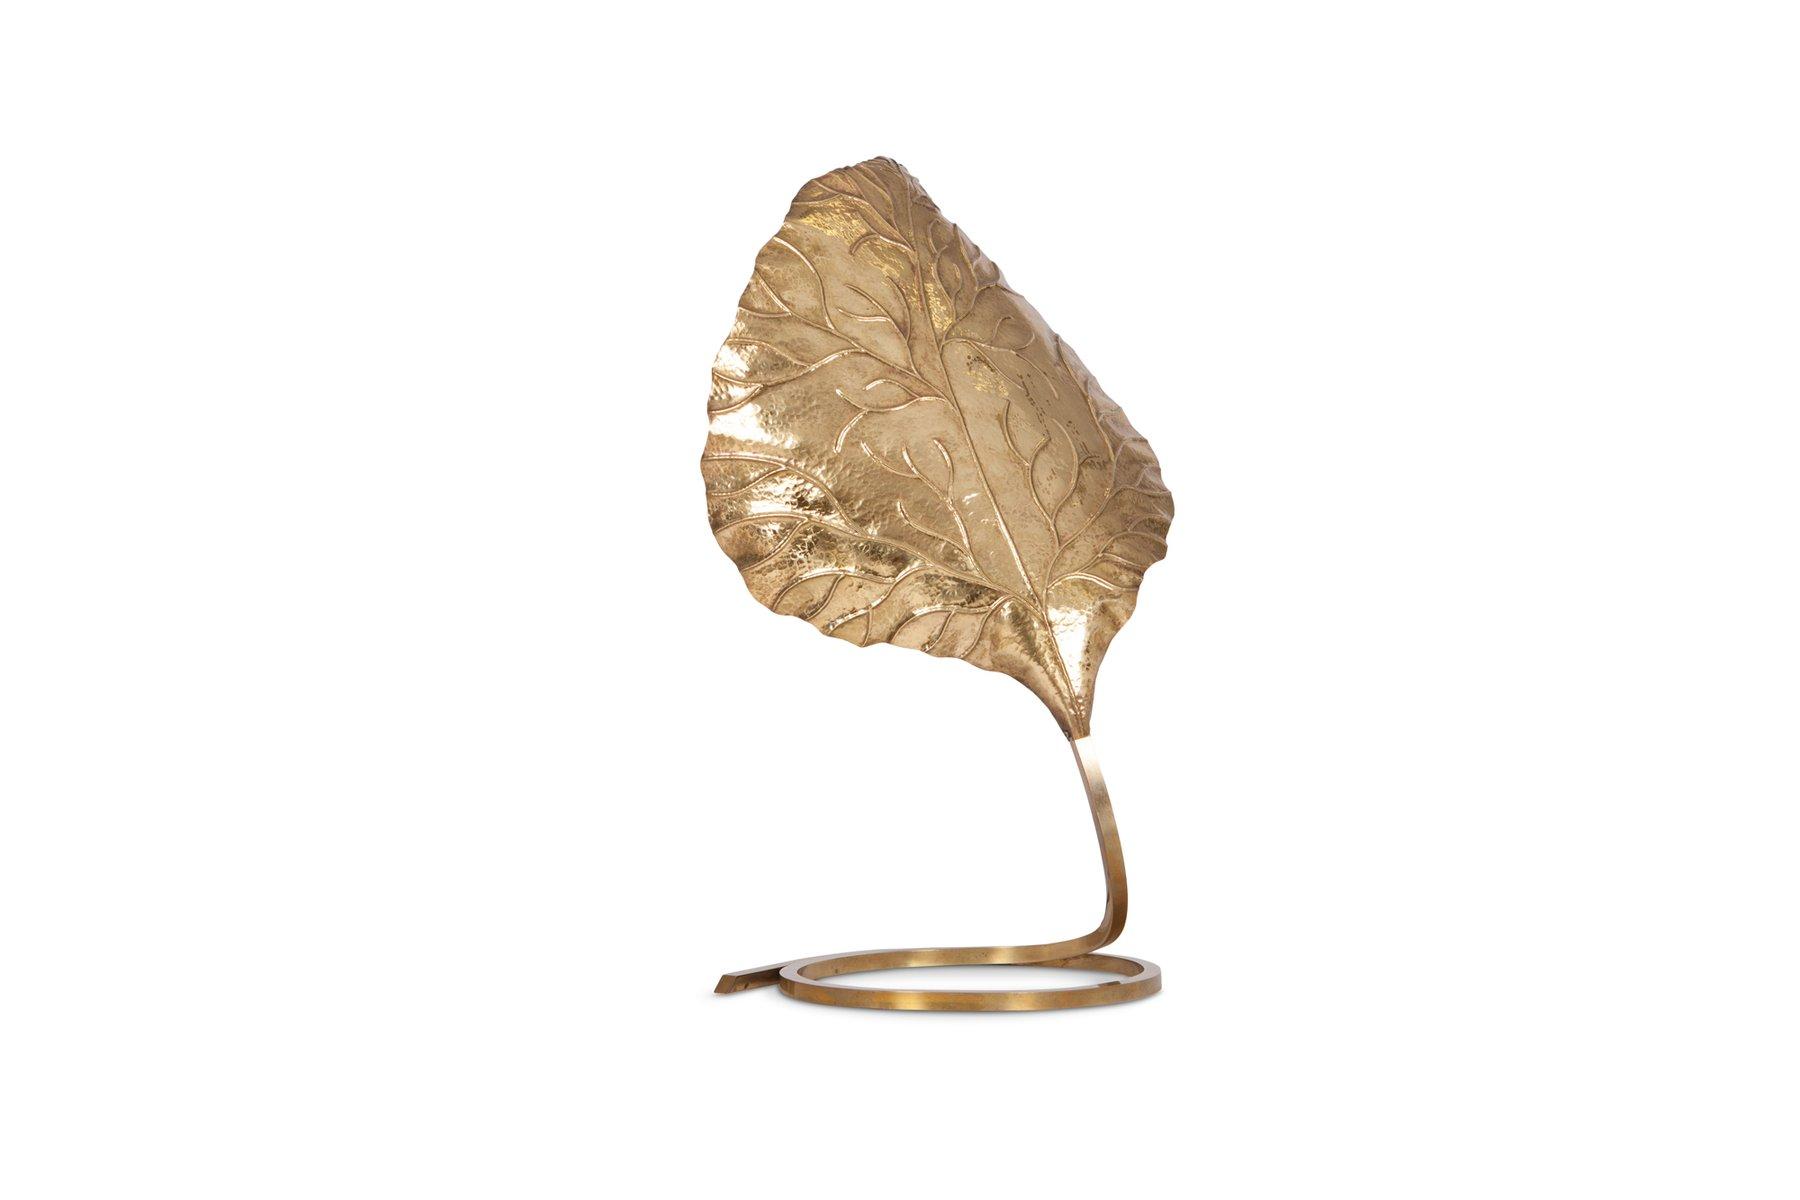 Modell Rabarbaro Messing Tischlampe von Carlo Giorgi für Bottega Gadda...